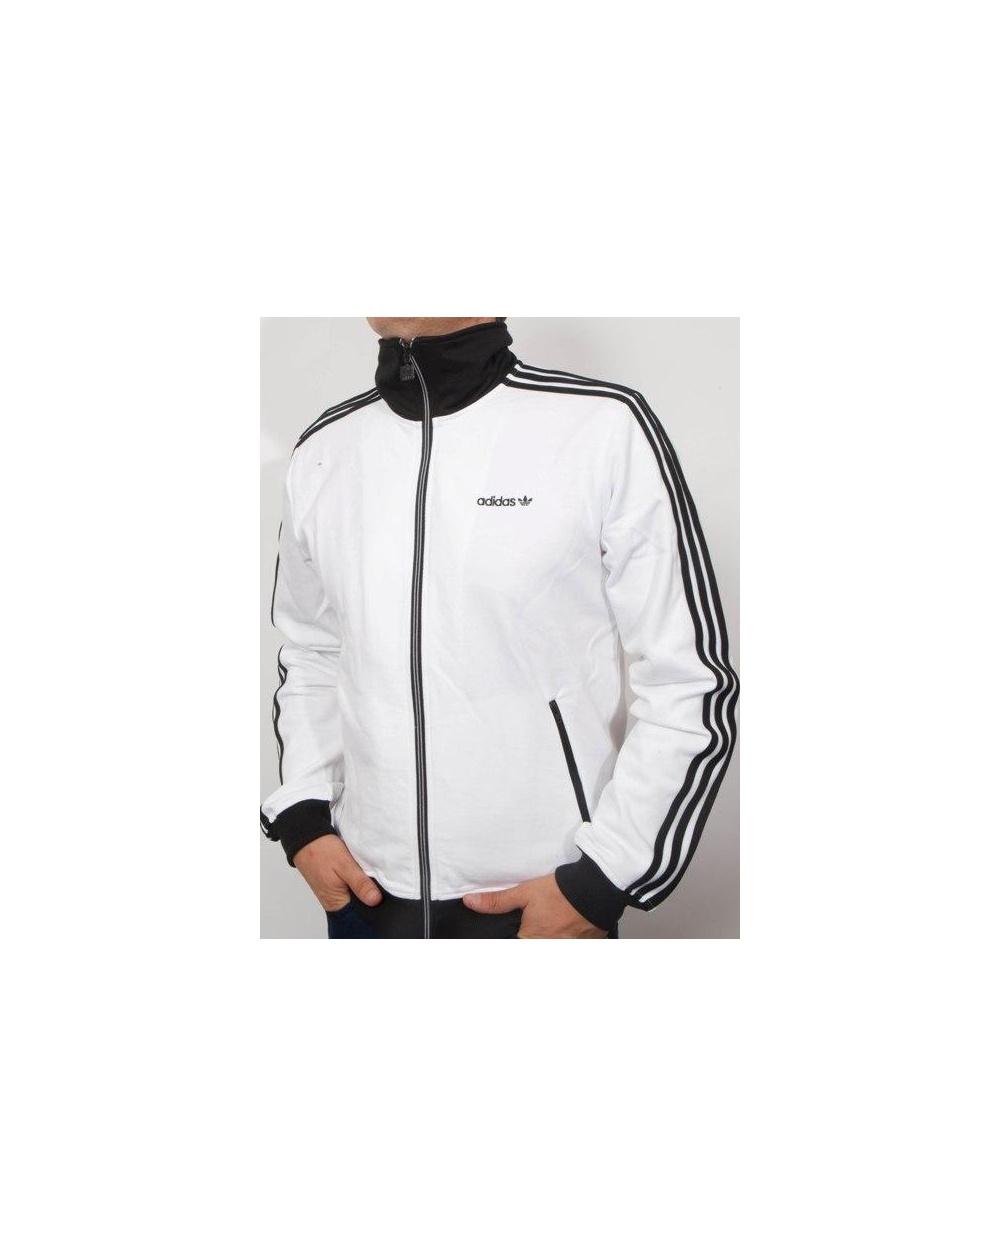 BECKENBAUER TRACK JACKET Man White black Adidas